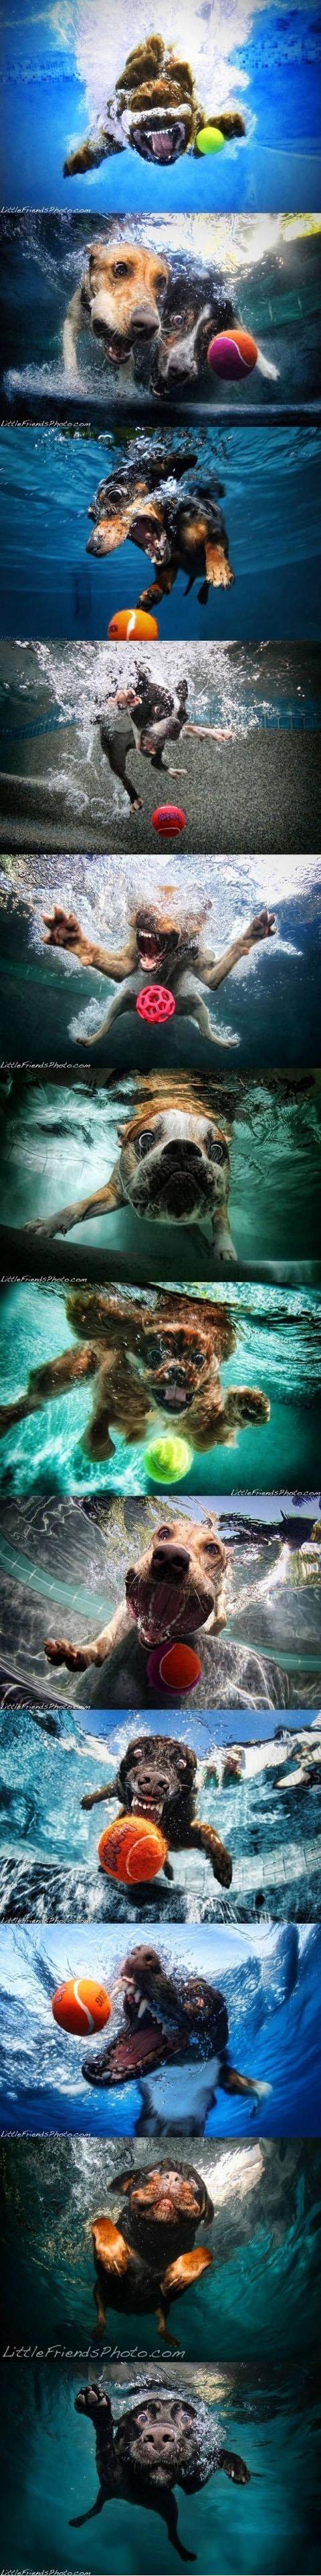 Dogs Underwater. . Dogs underwater funny